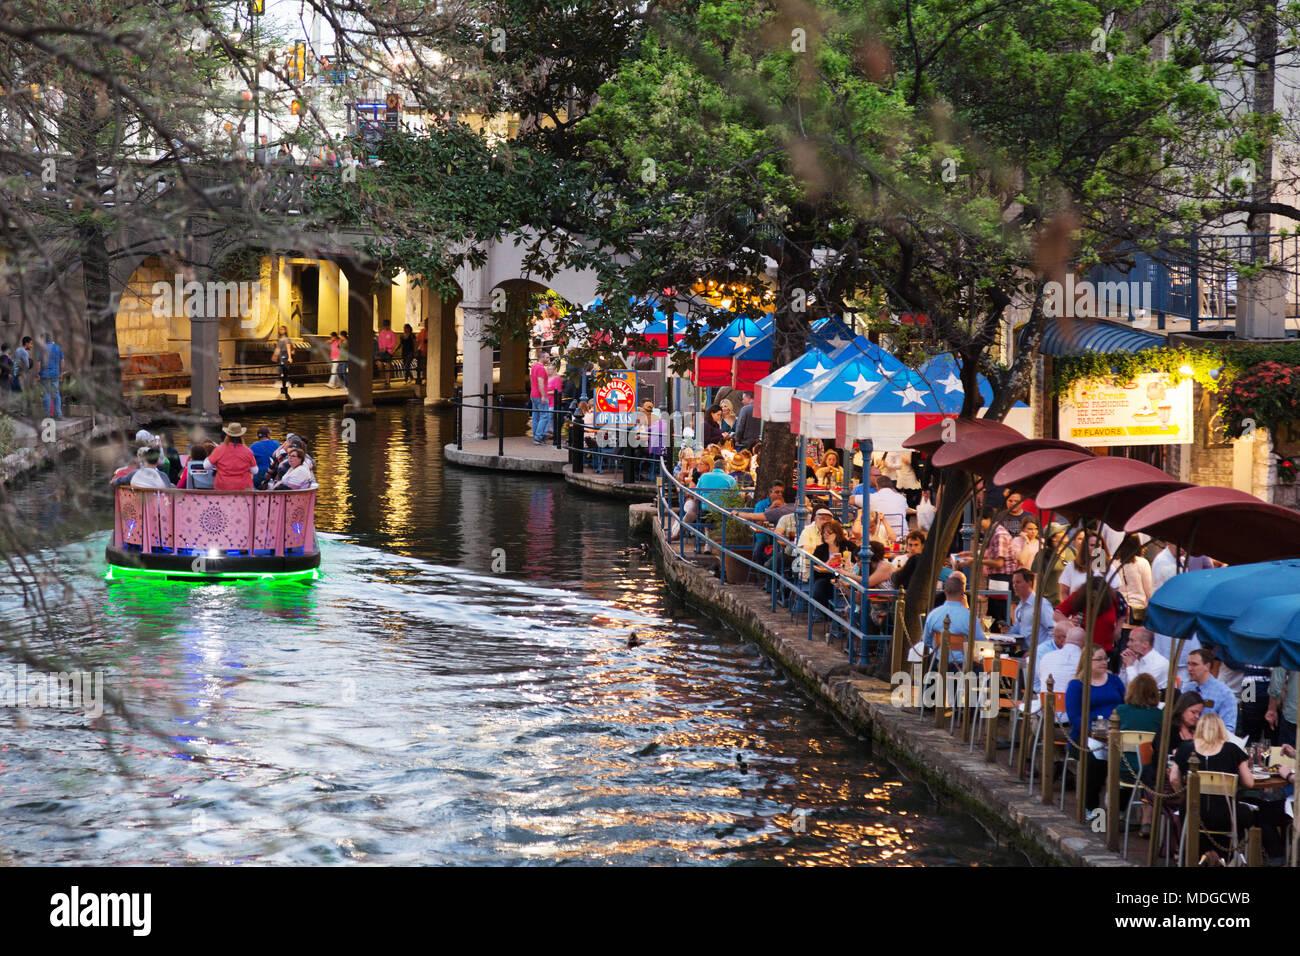 San Antonio River Walk -  - A tourist boat on the San Antonio river passing restaurants at dusk; the San Antonio Riverwalk, San Antonio Texas USA - Stock Image